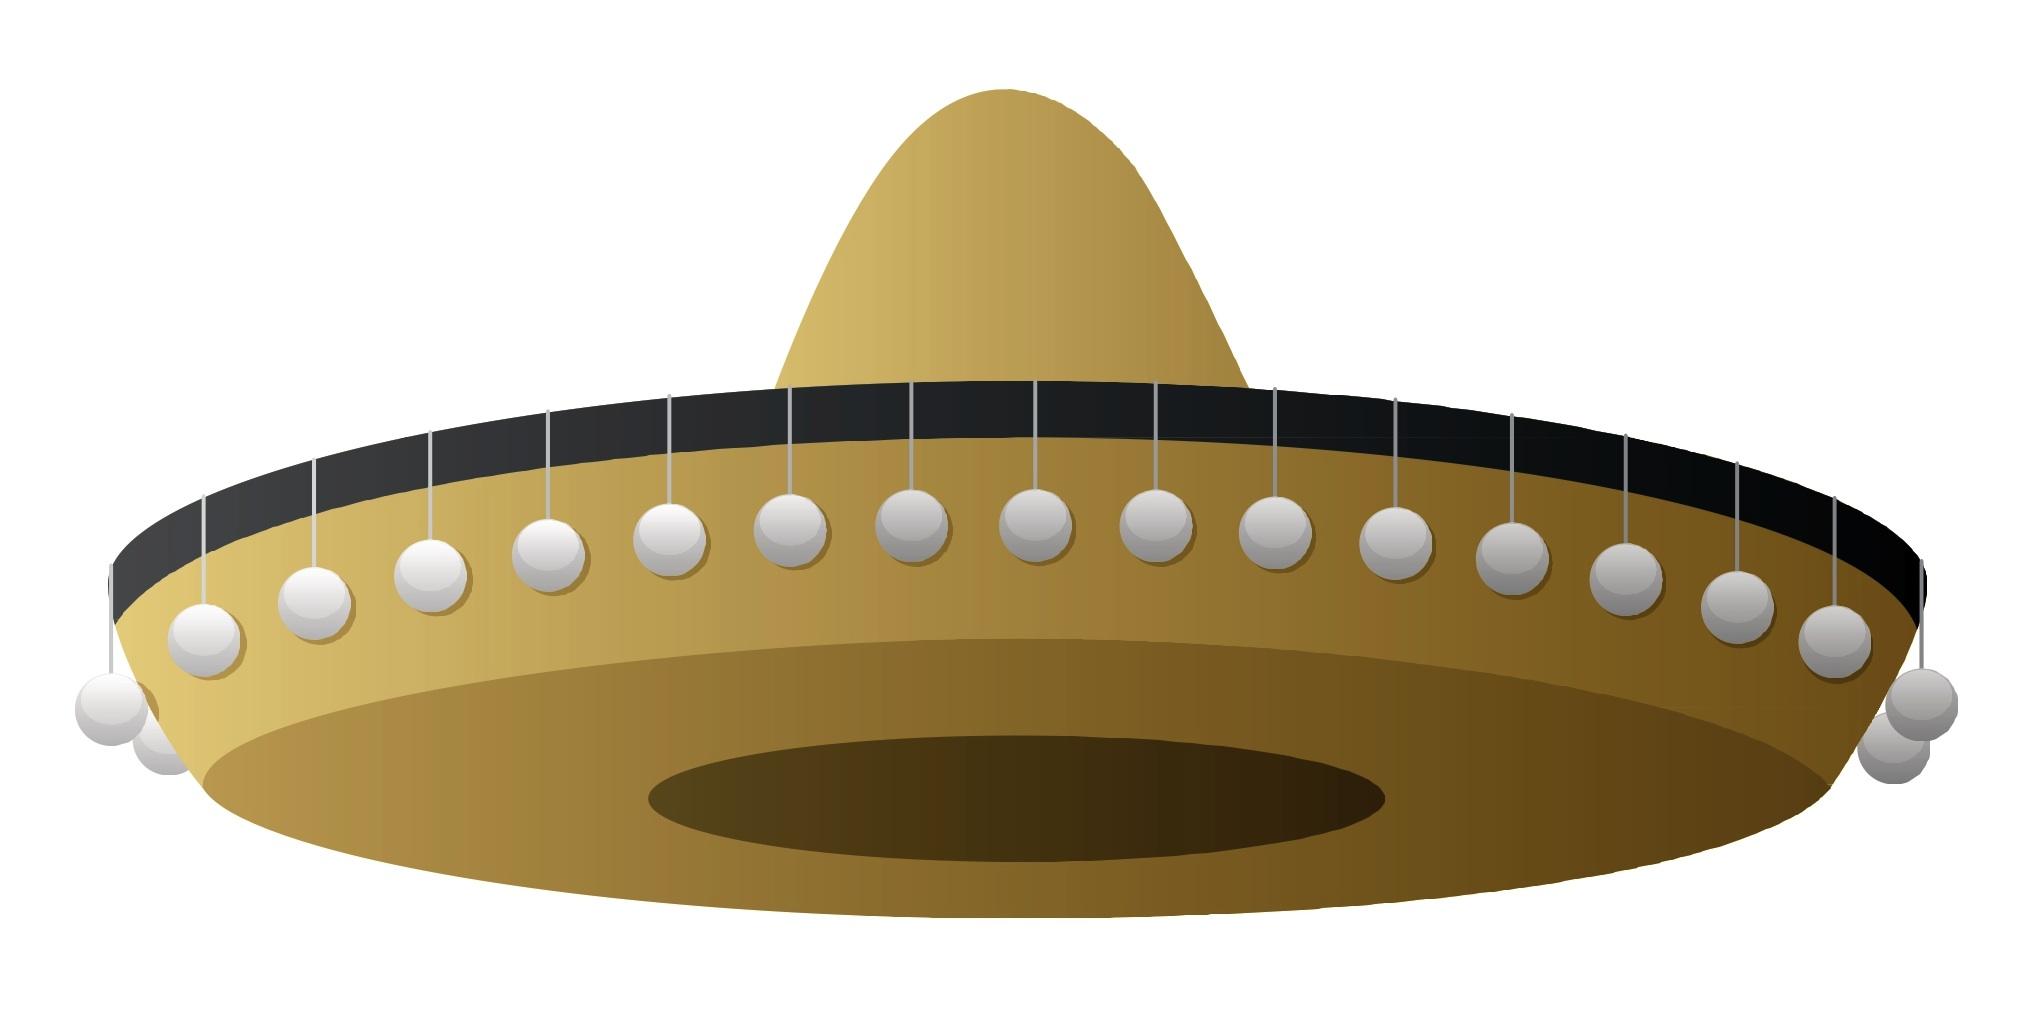 clip art mexican hat - photo #22